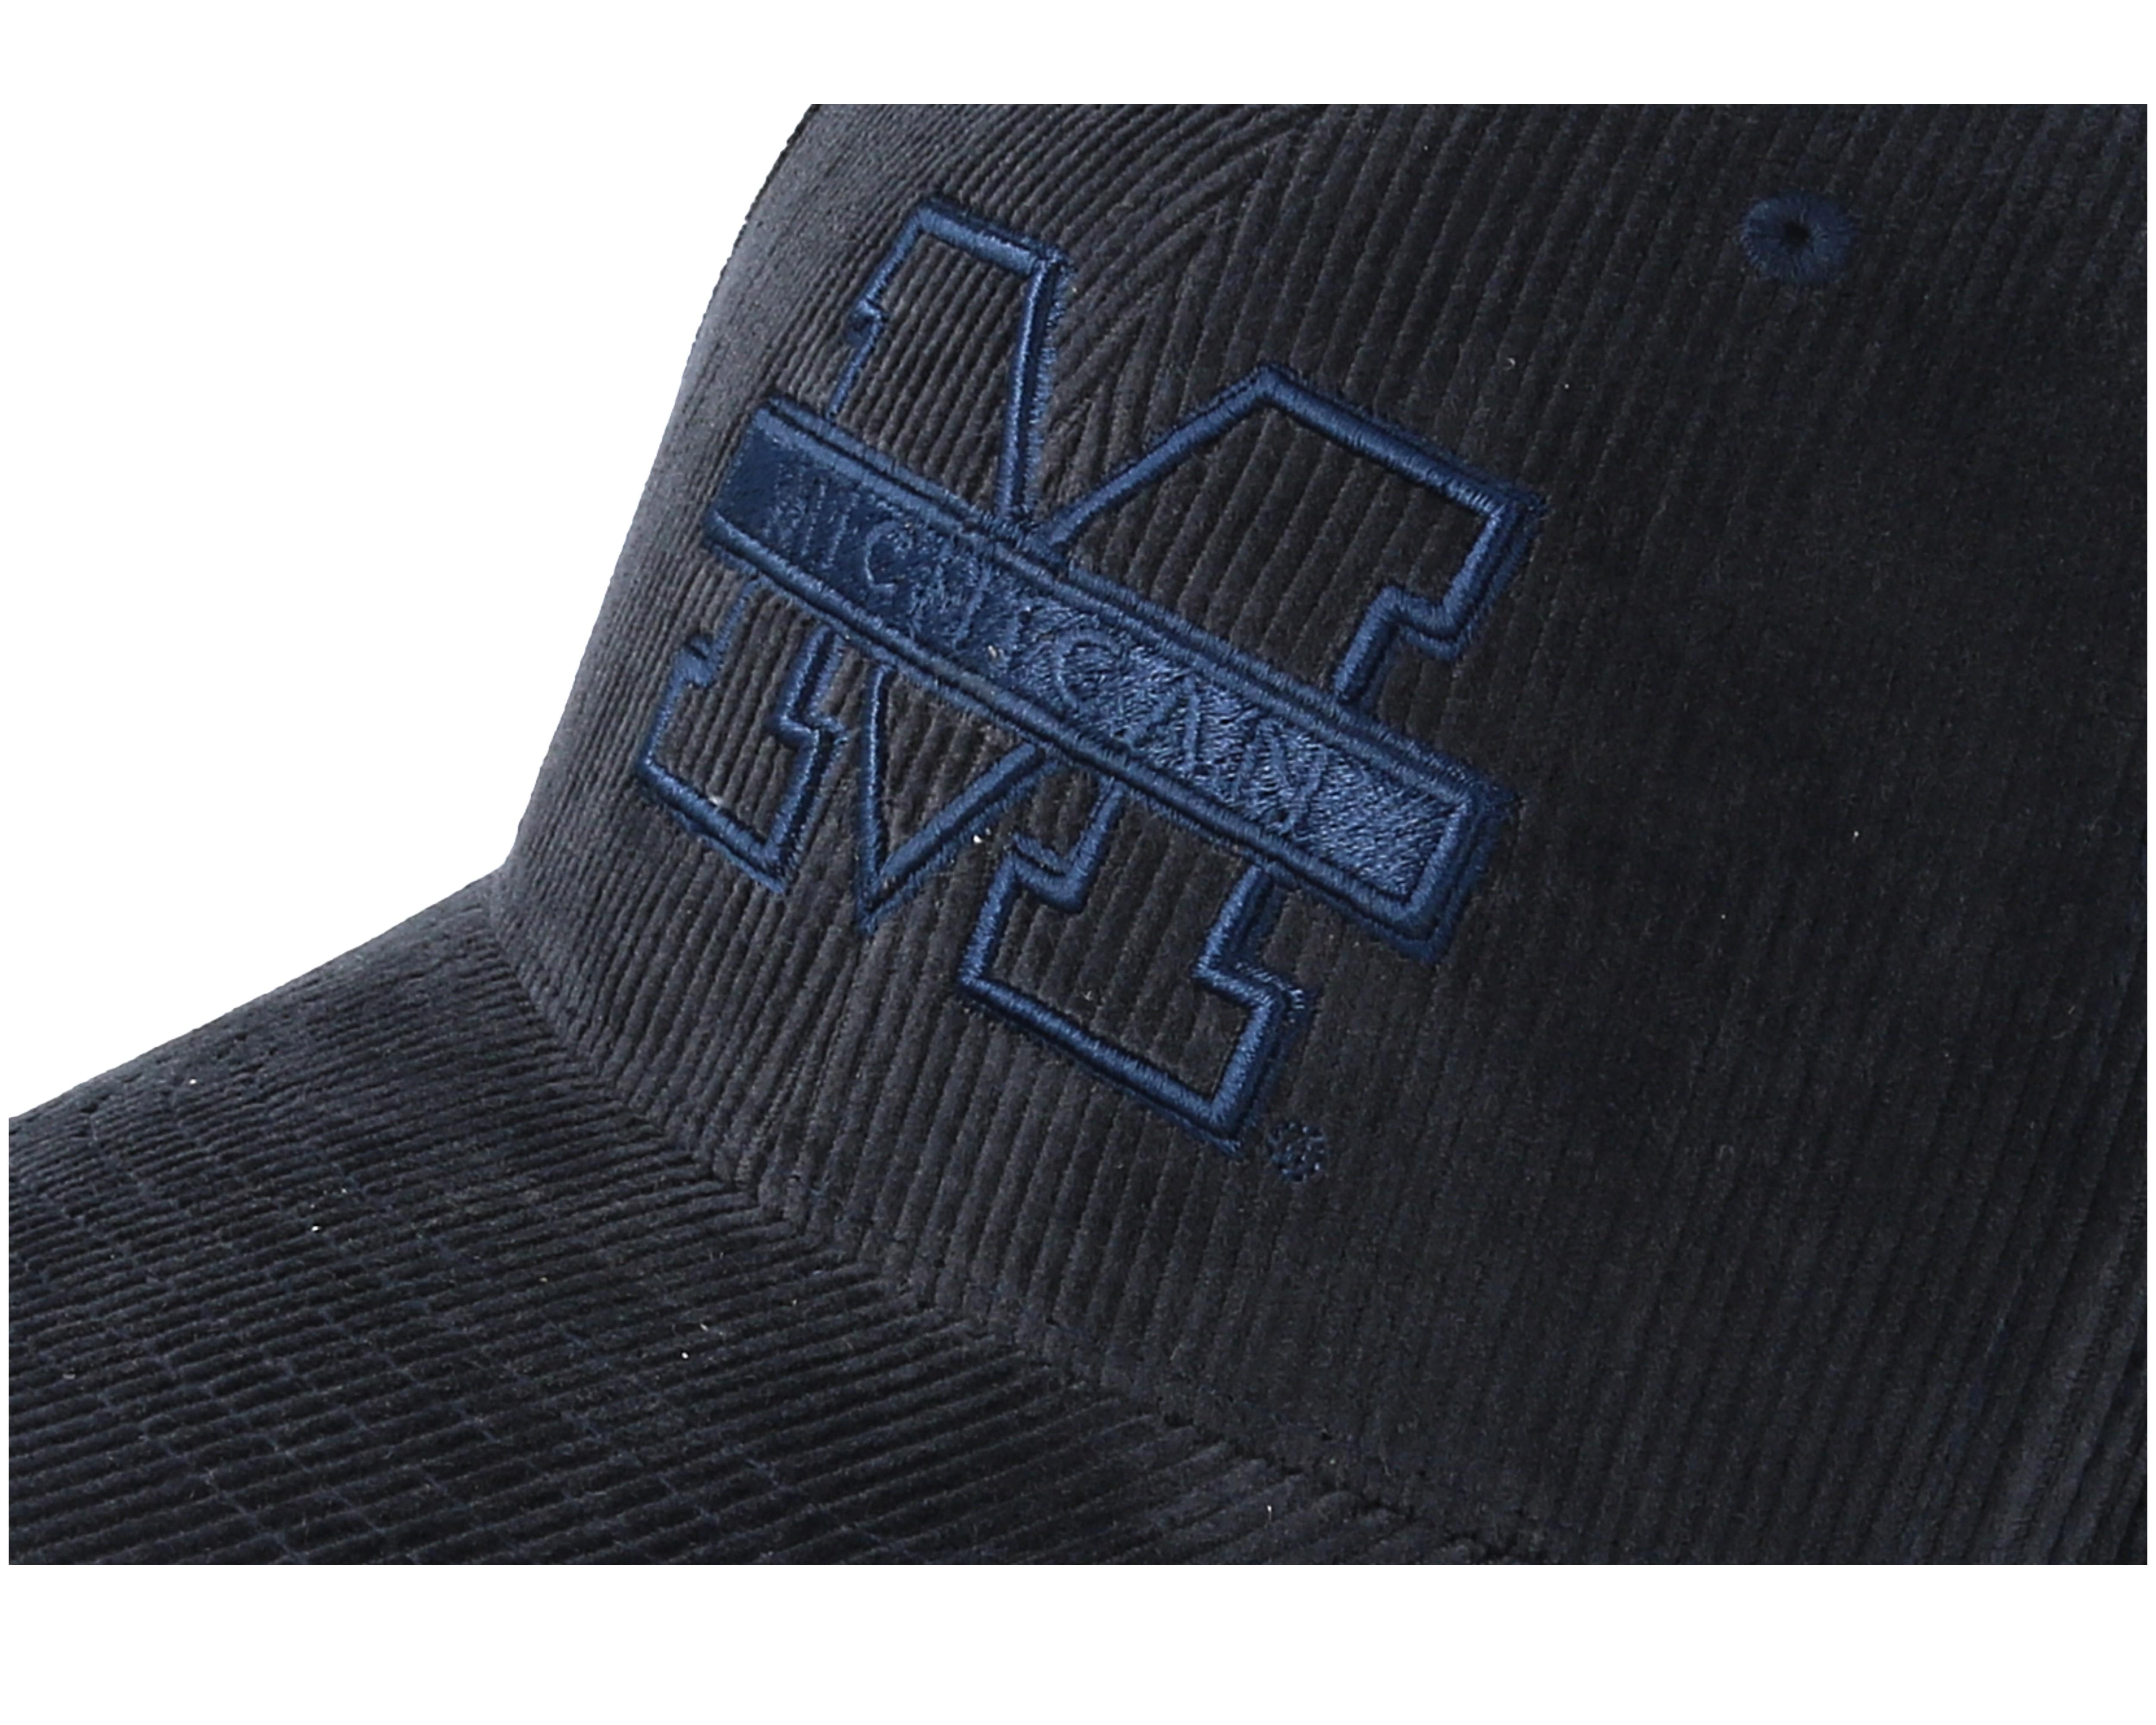 Oakley Det Cord >> Michigan Wolverines Cord Indigo Adjustable - Mitchell & Ness cap - Hatstore.de